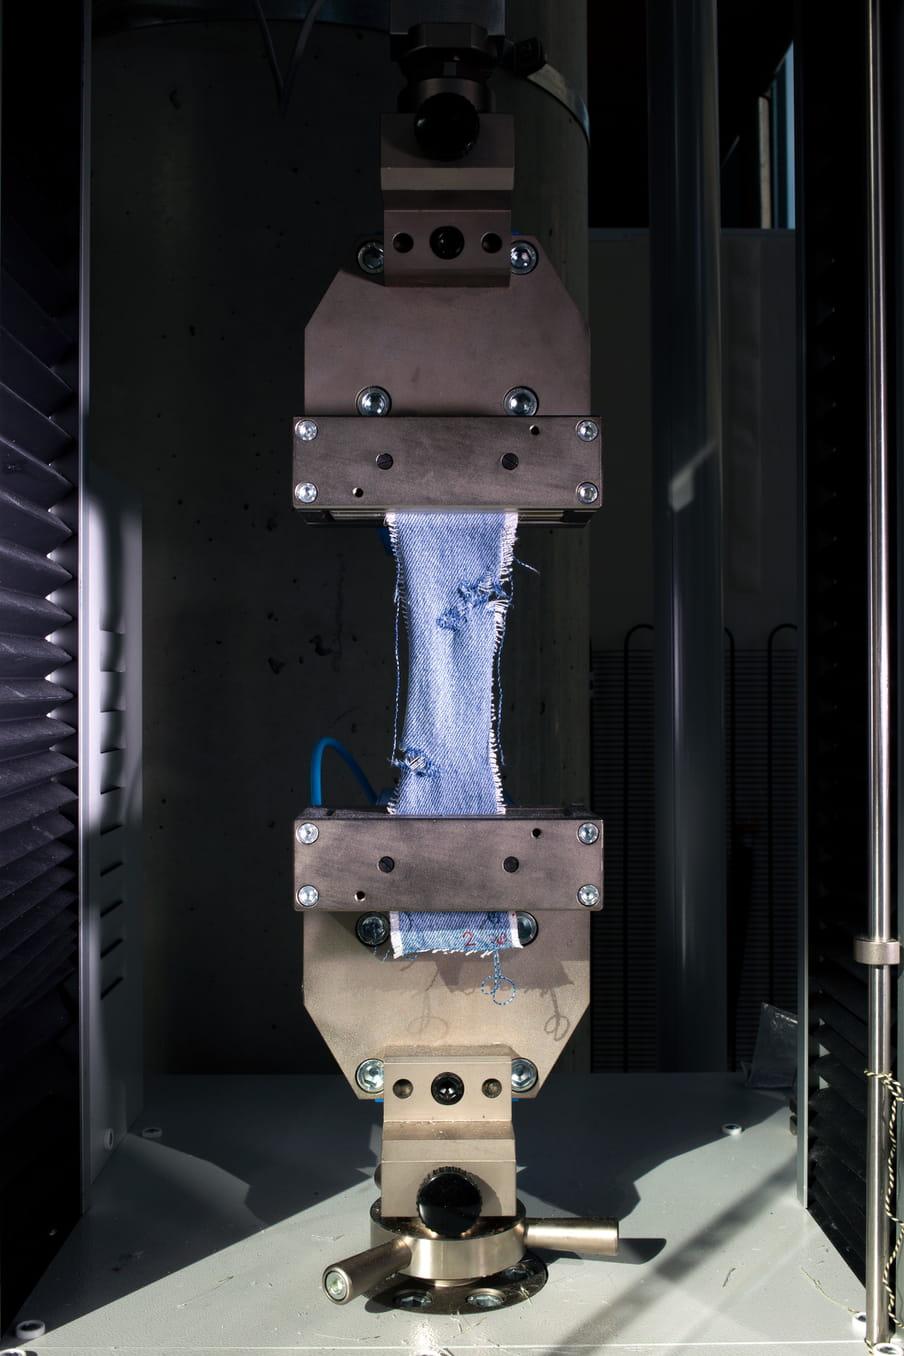 Photo of a machine pulling on fabric